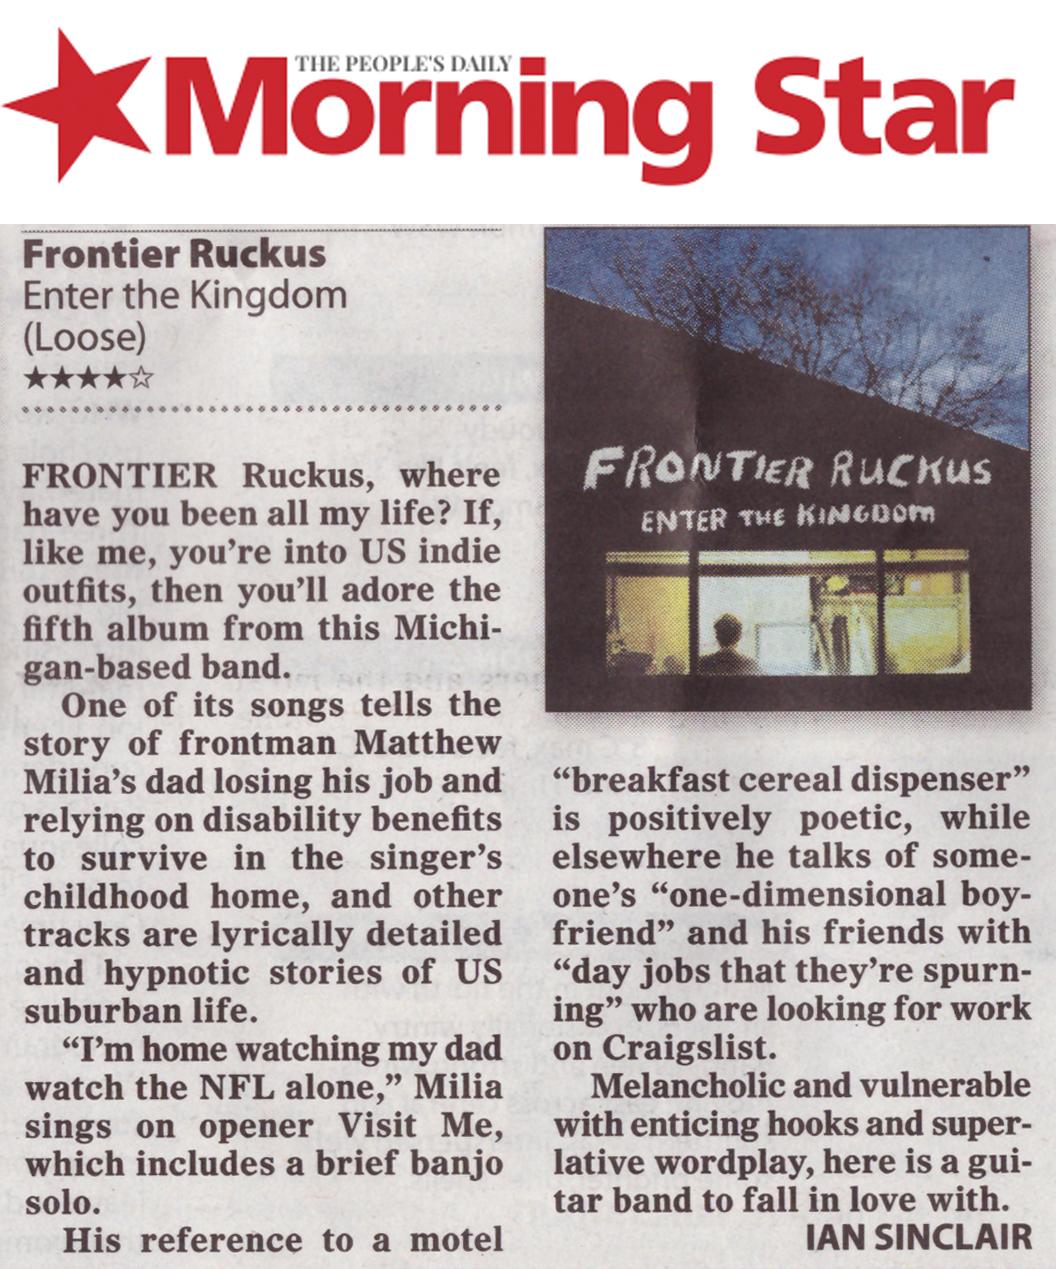 Frontier Ruckus - Morning Star - 28 February 2017